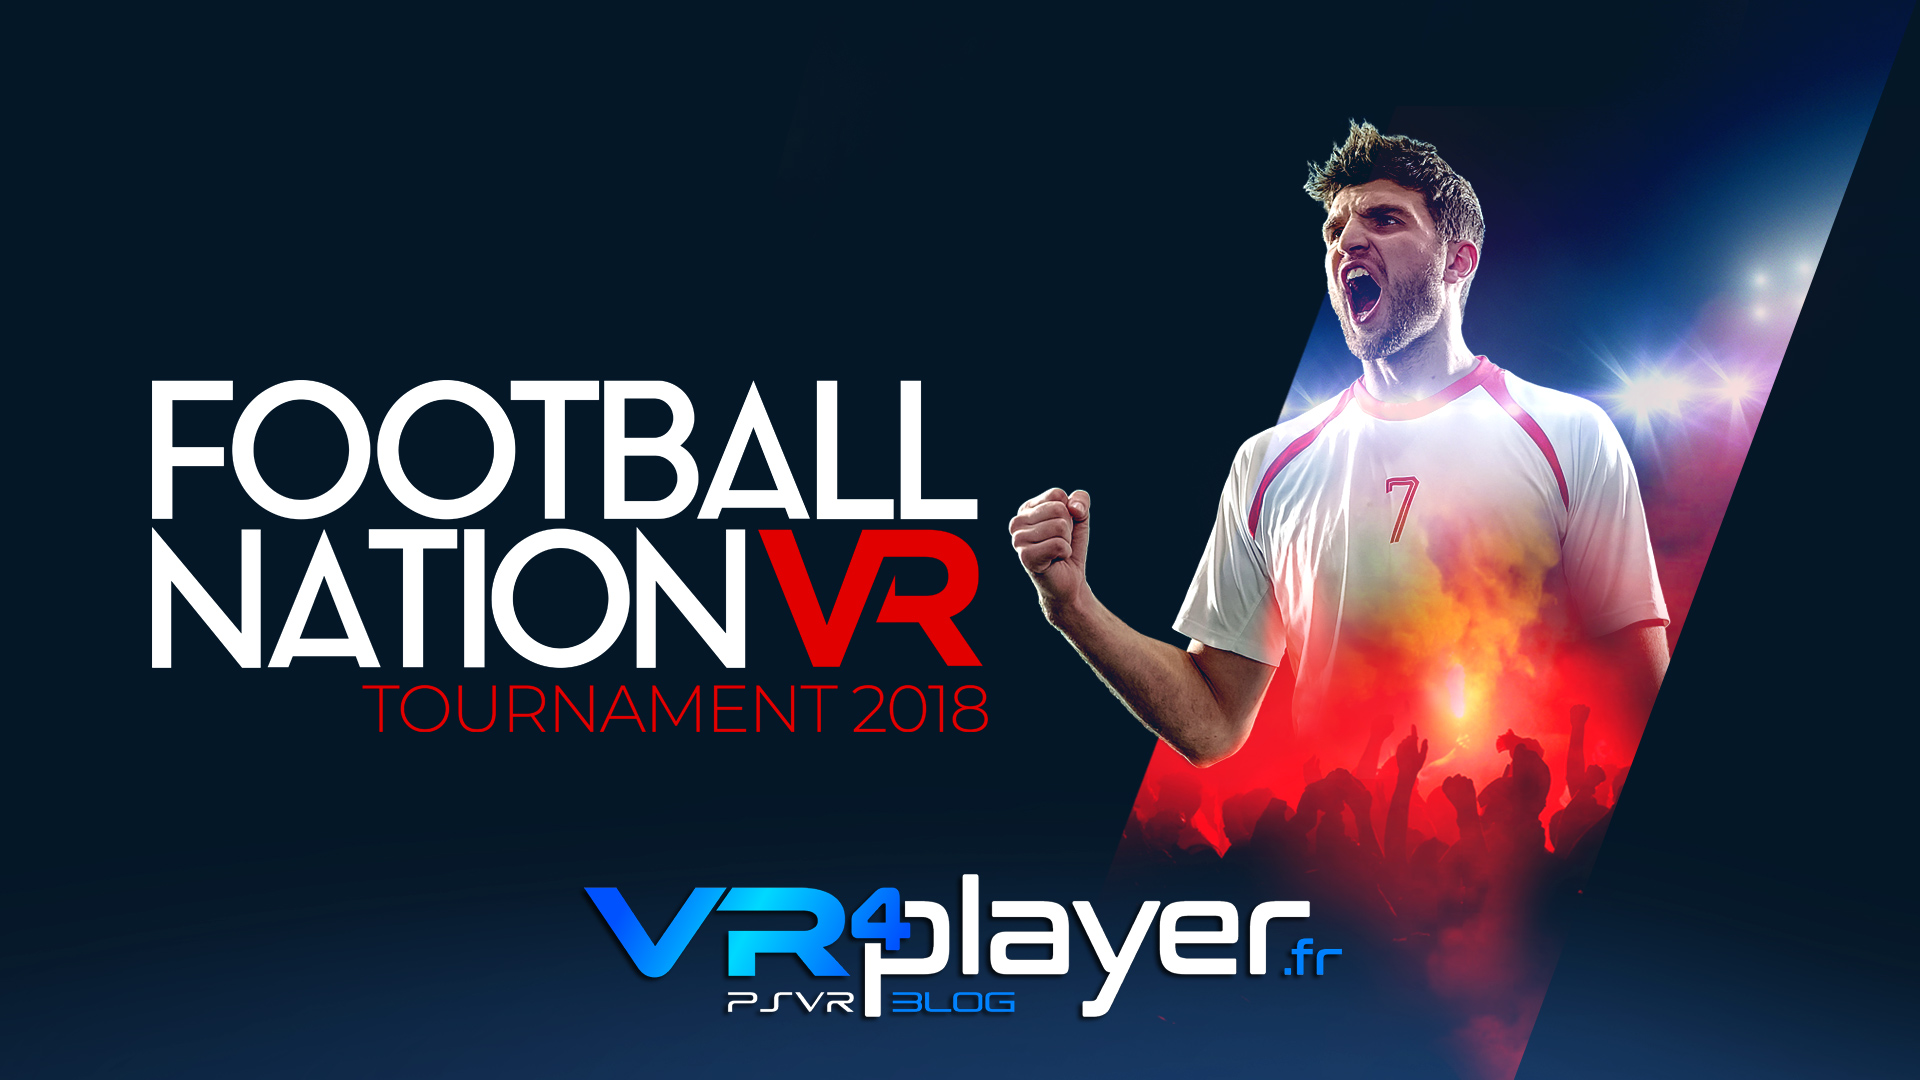 Football Nation VR PSVR vr4player.fr